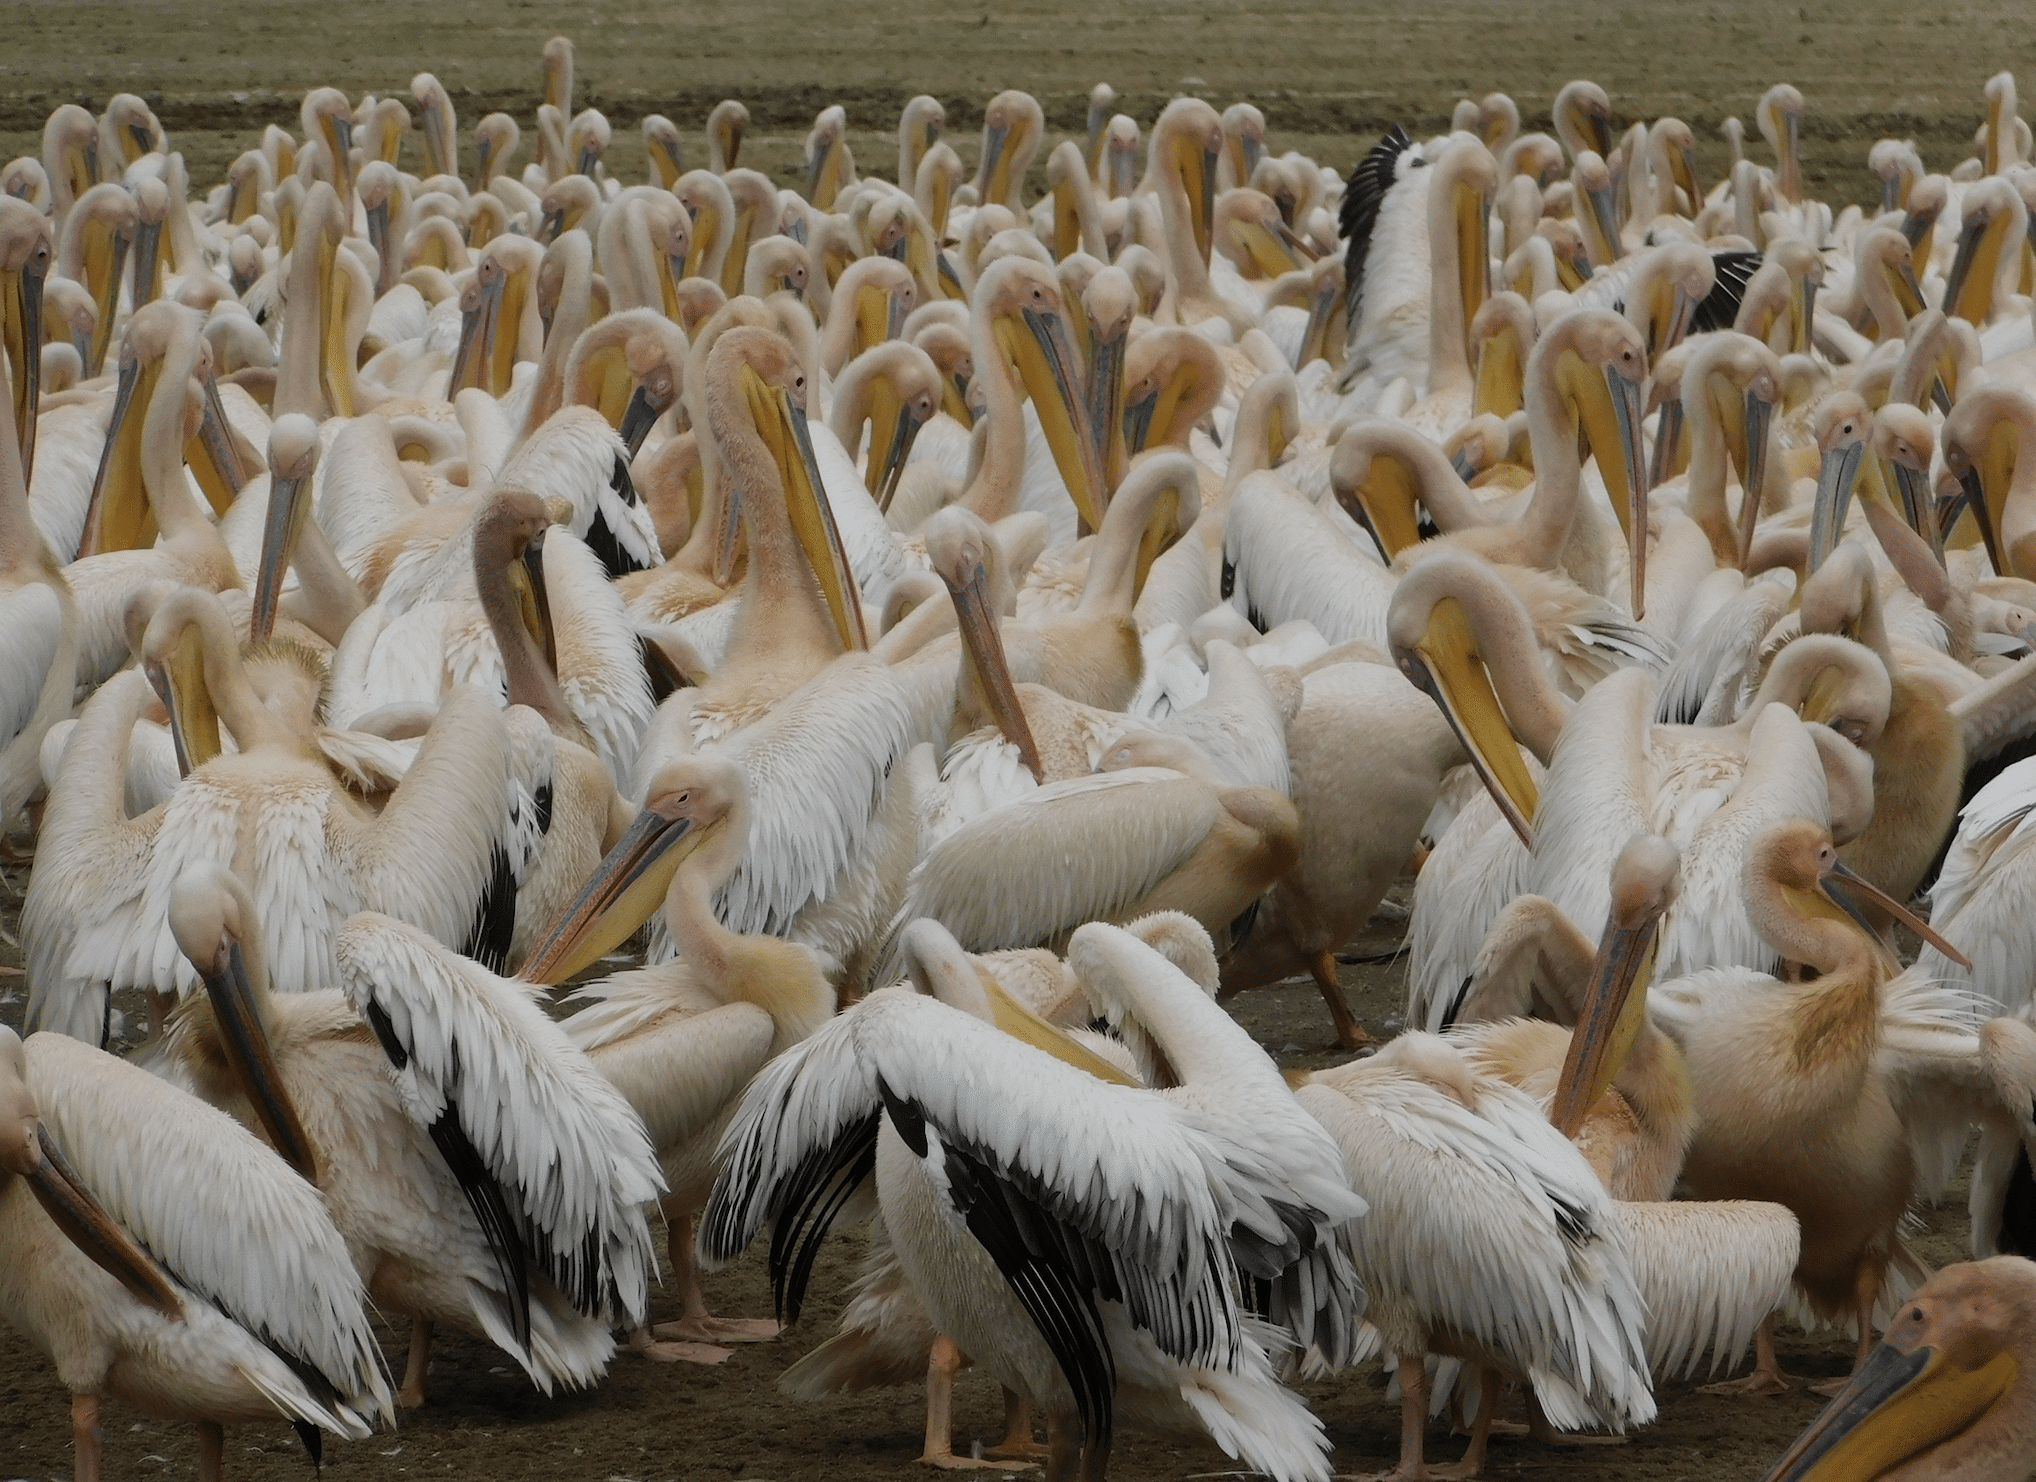 safari en tanzanie : pelicans dans le parc du lac manyara